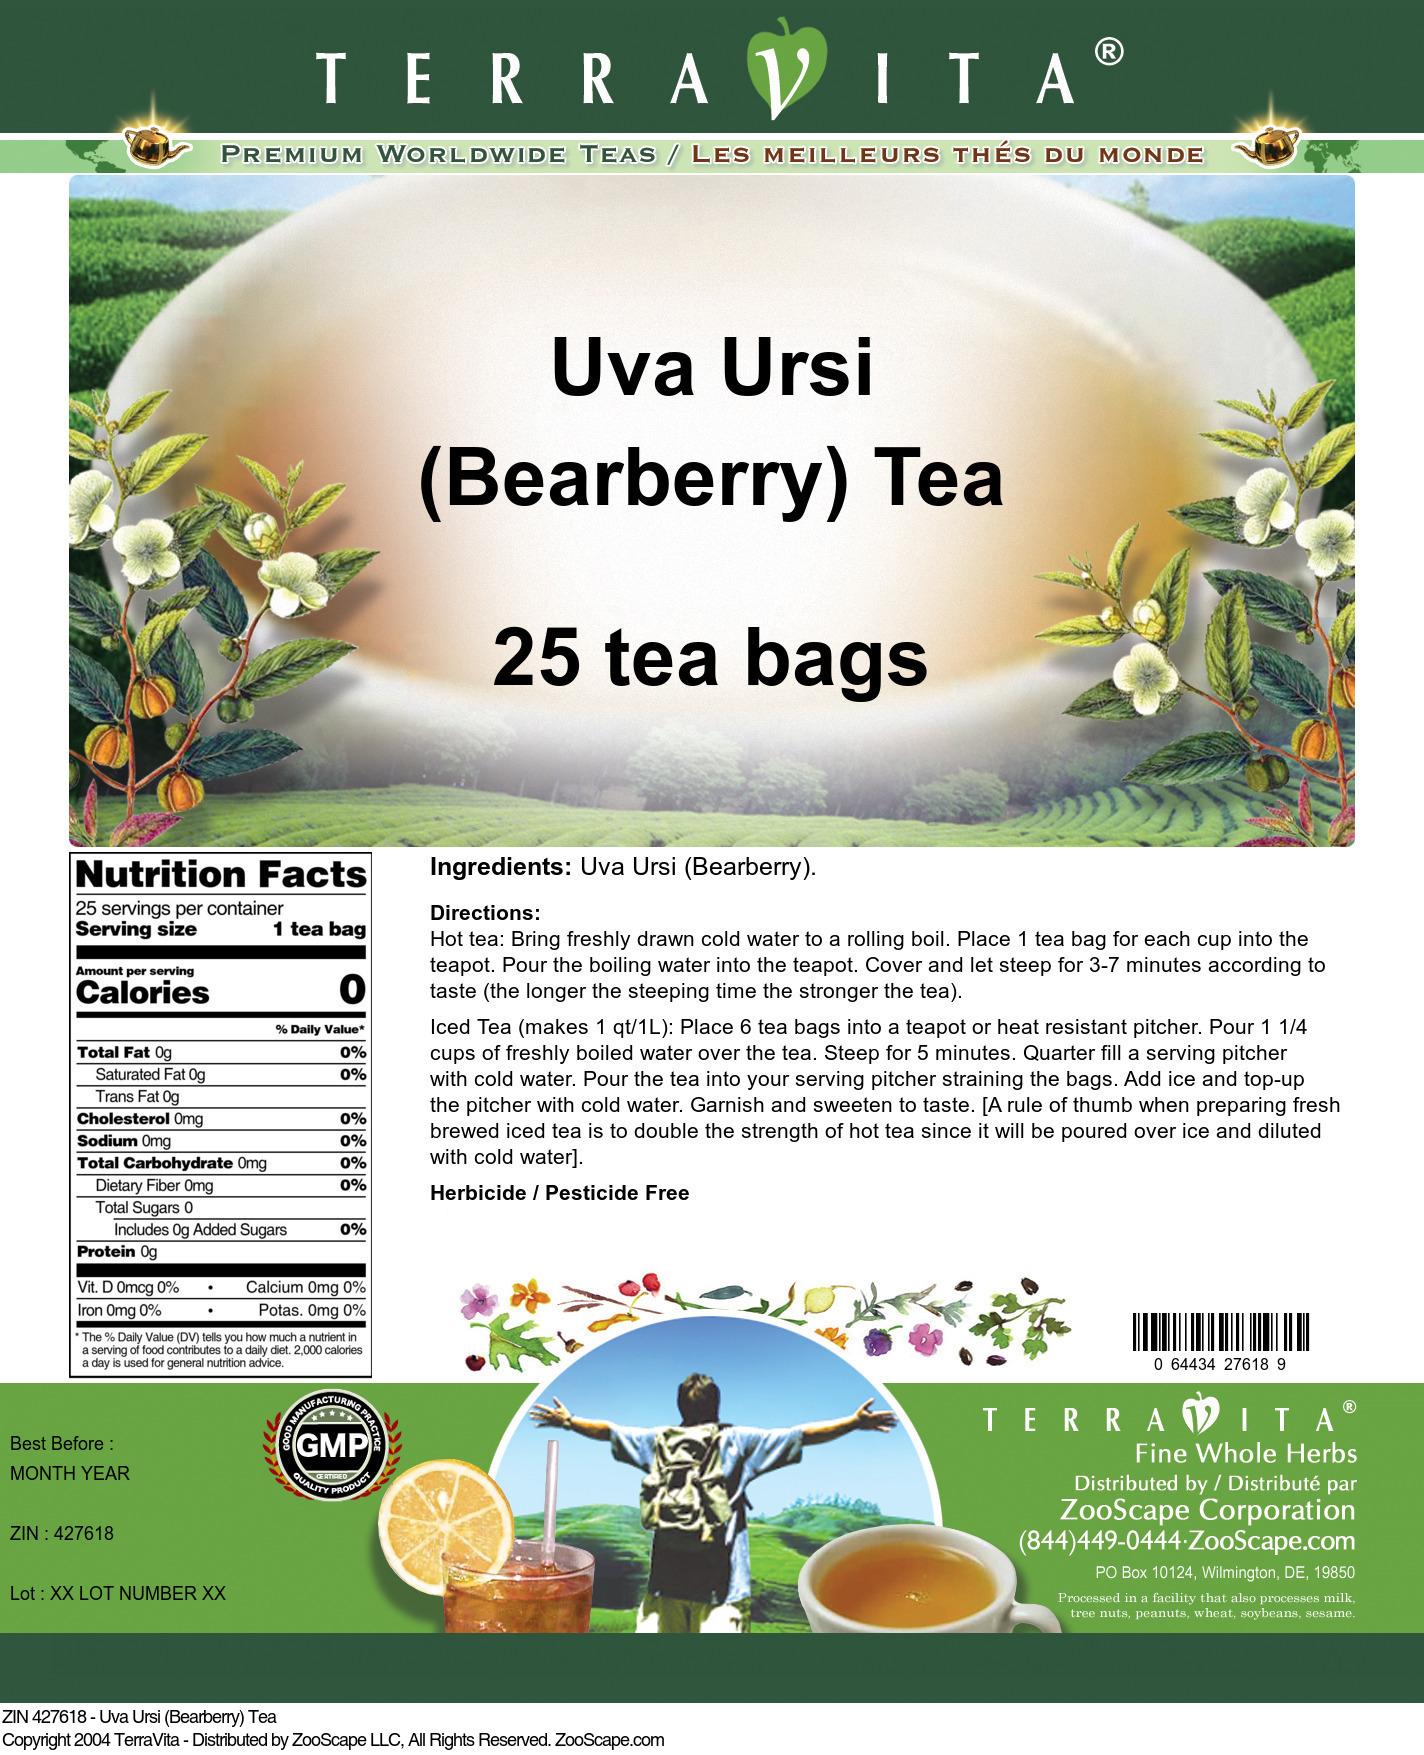 Uva Ursi (Bearberry) Tea